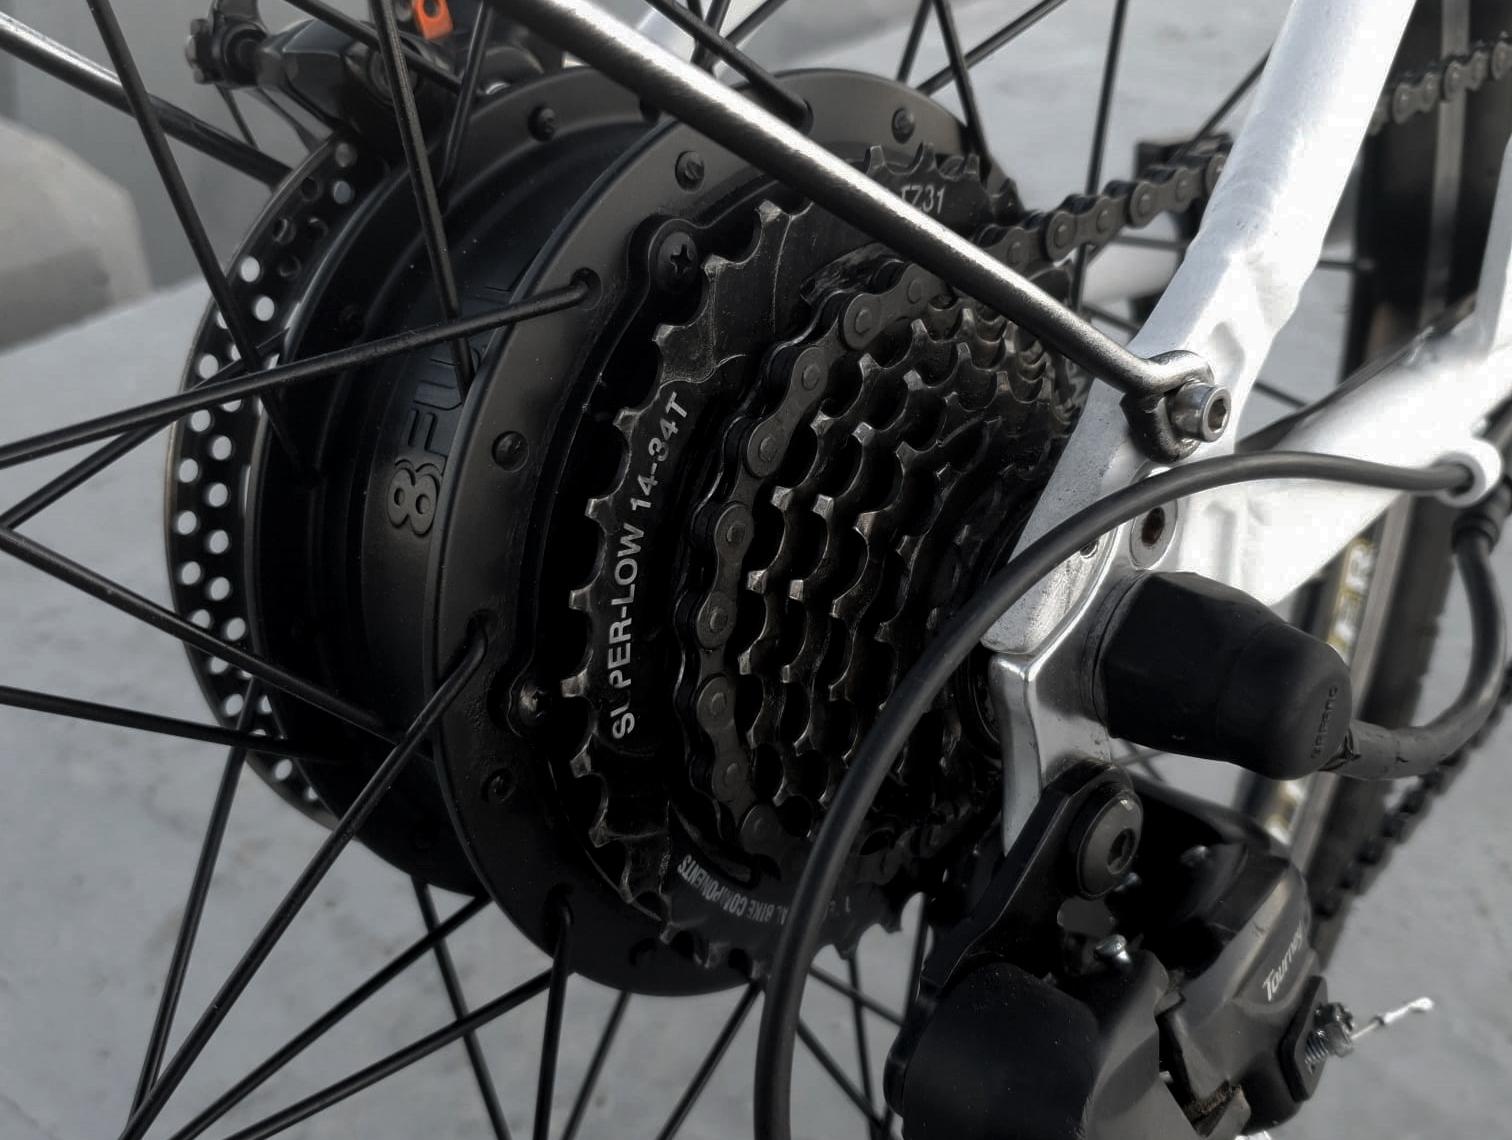 Foto de detailles de la Bicicleta Electrica